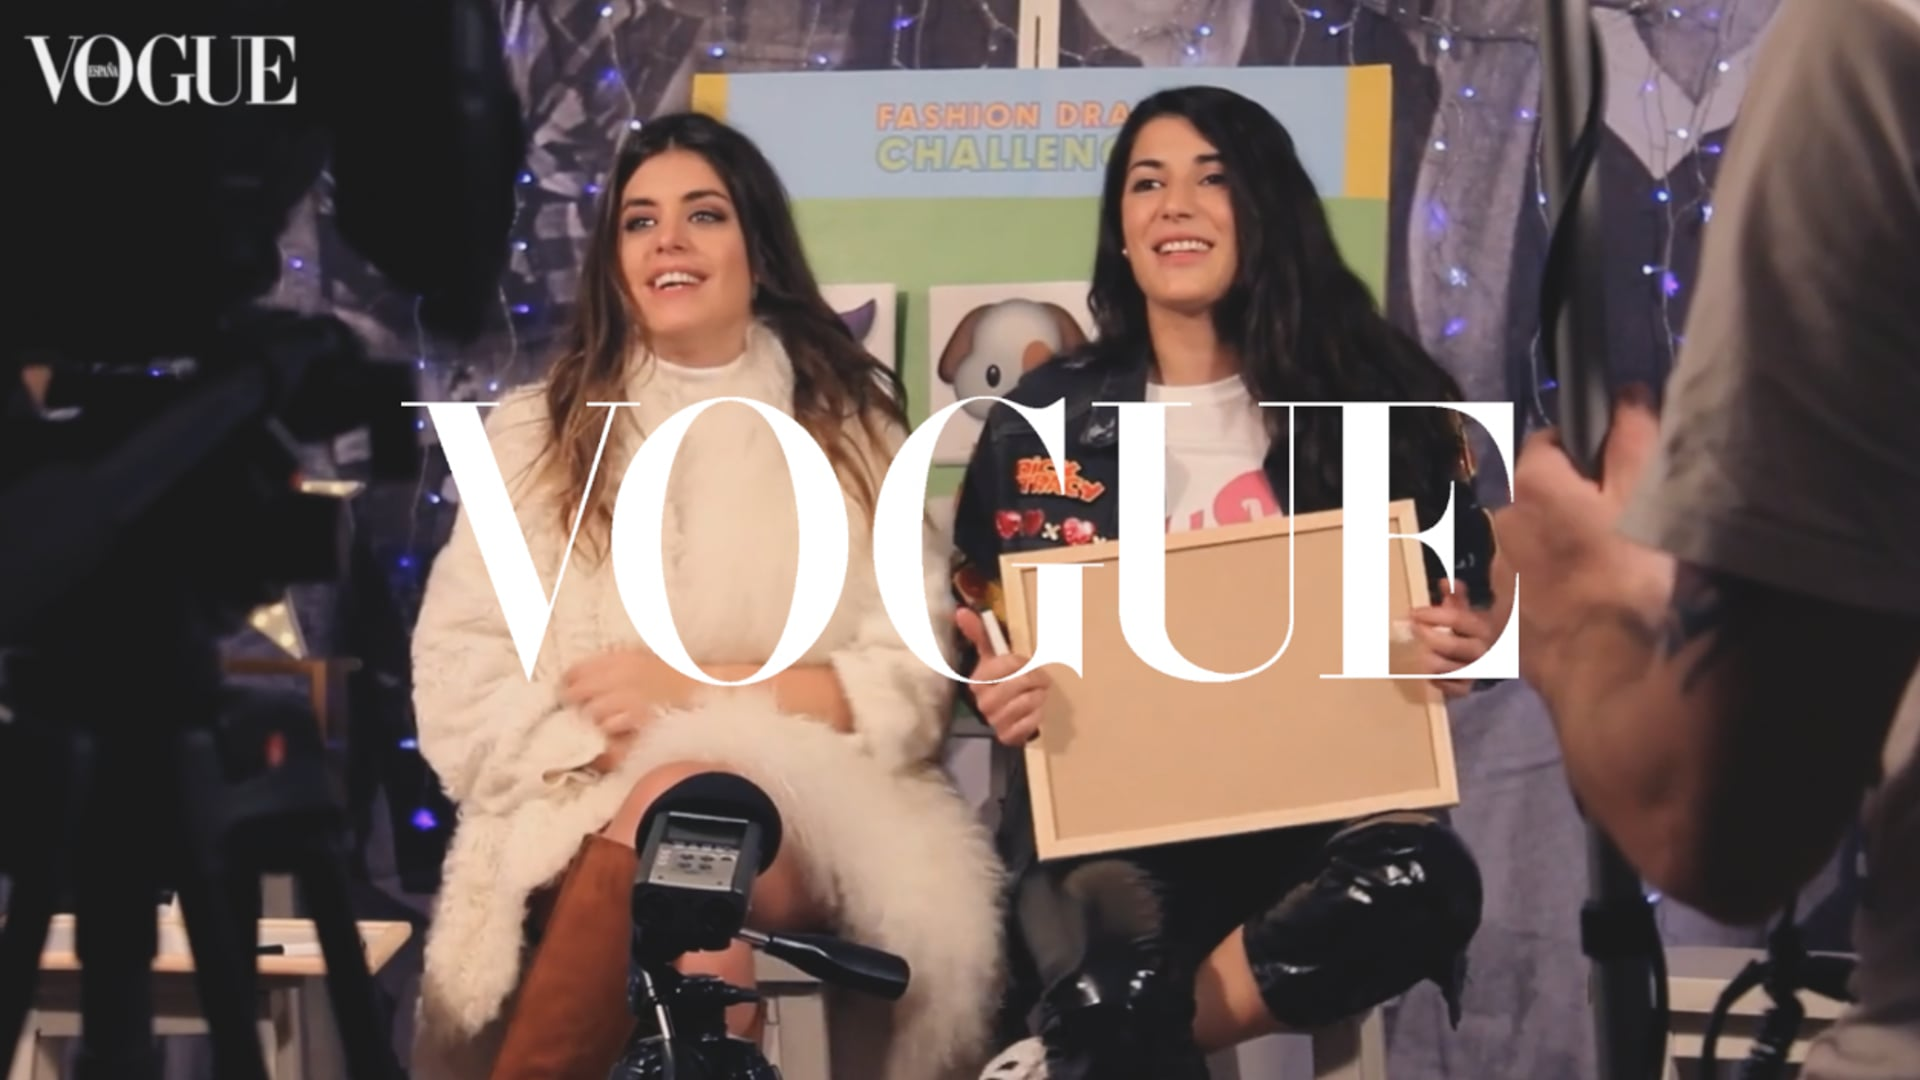 VOGUE Spain - Fashion Drama Making Of con Dulceida y Alba (vídeo: Leire Garmendia)